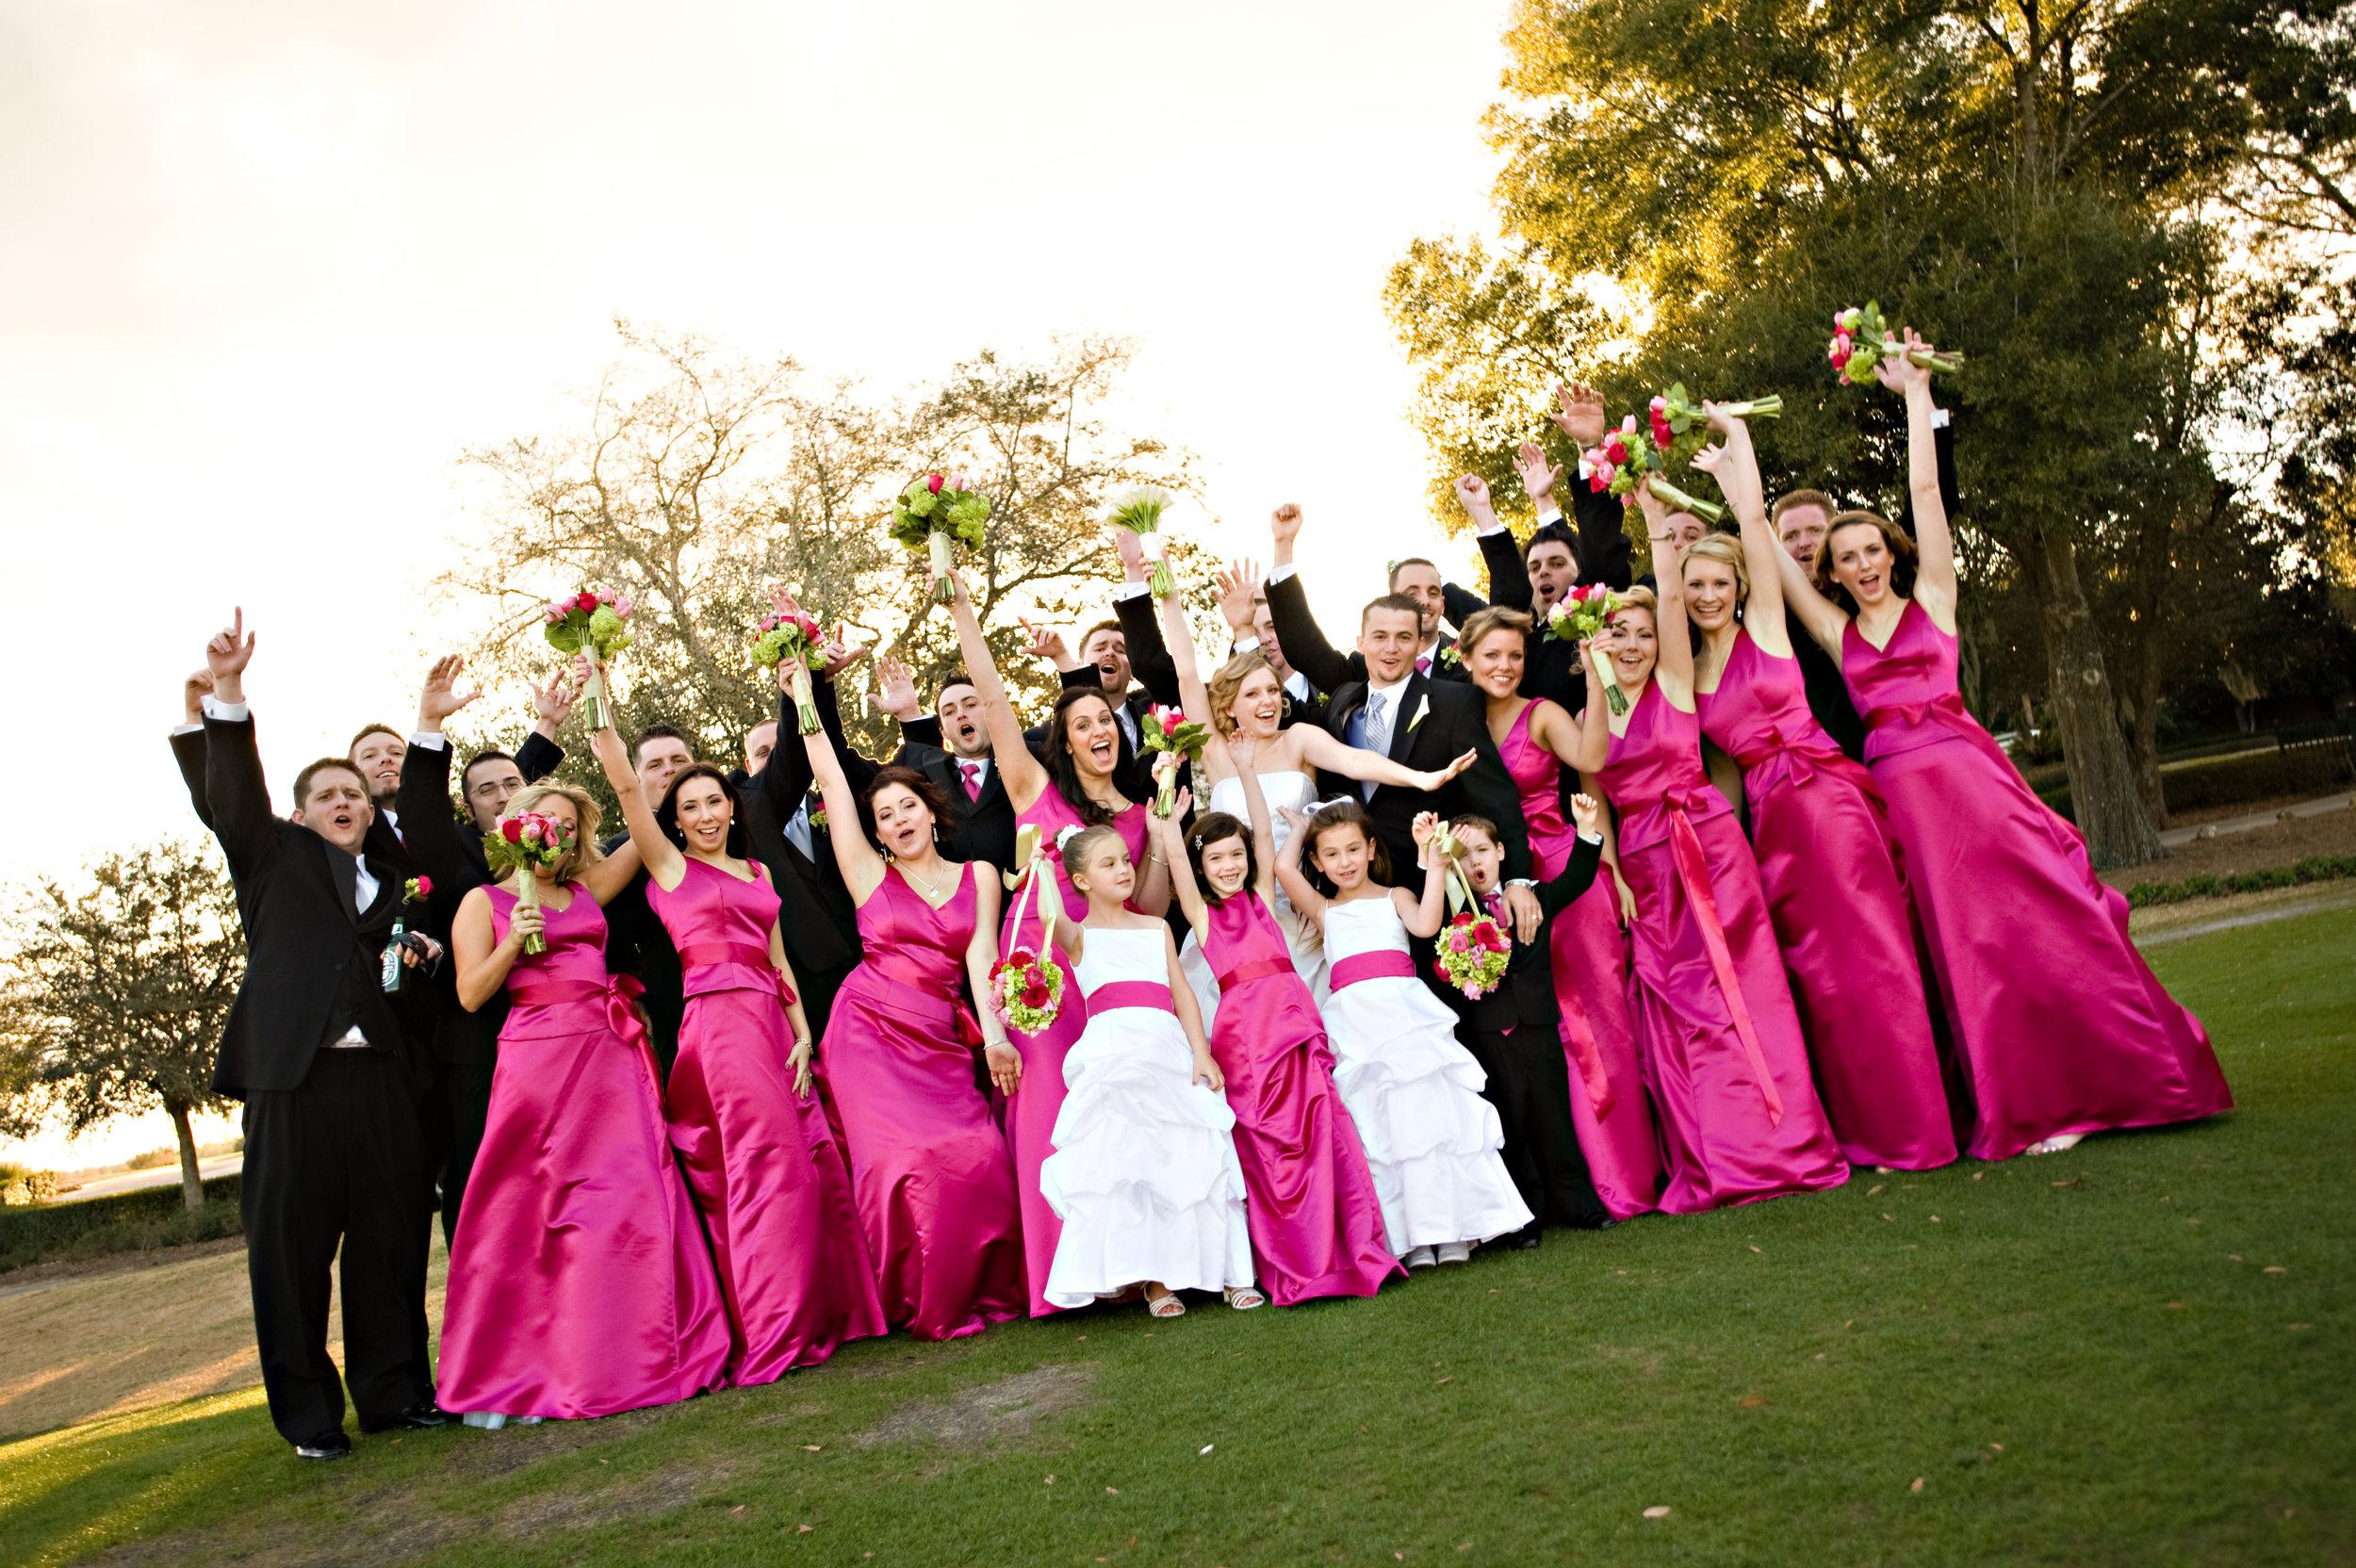 Wedding dresses - Bridesmaids Dresses